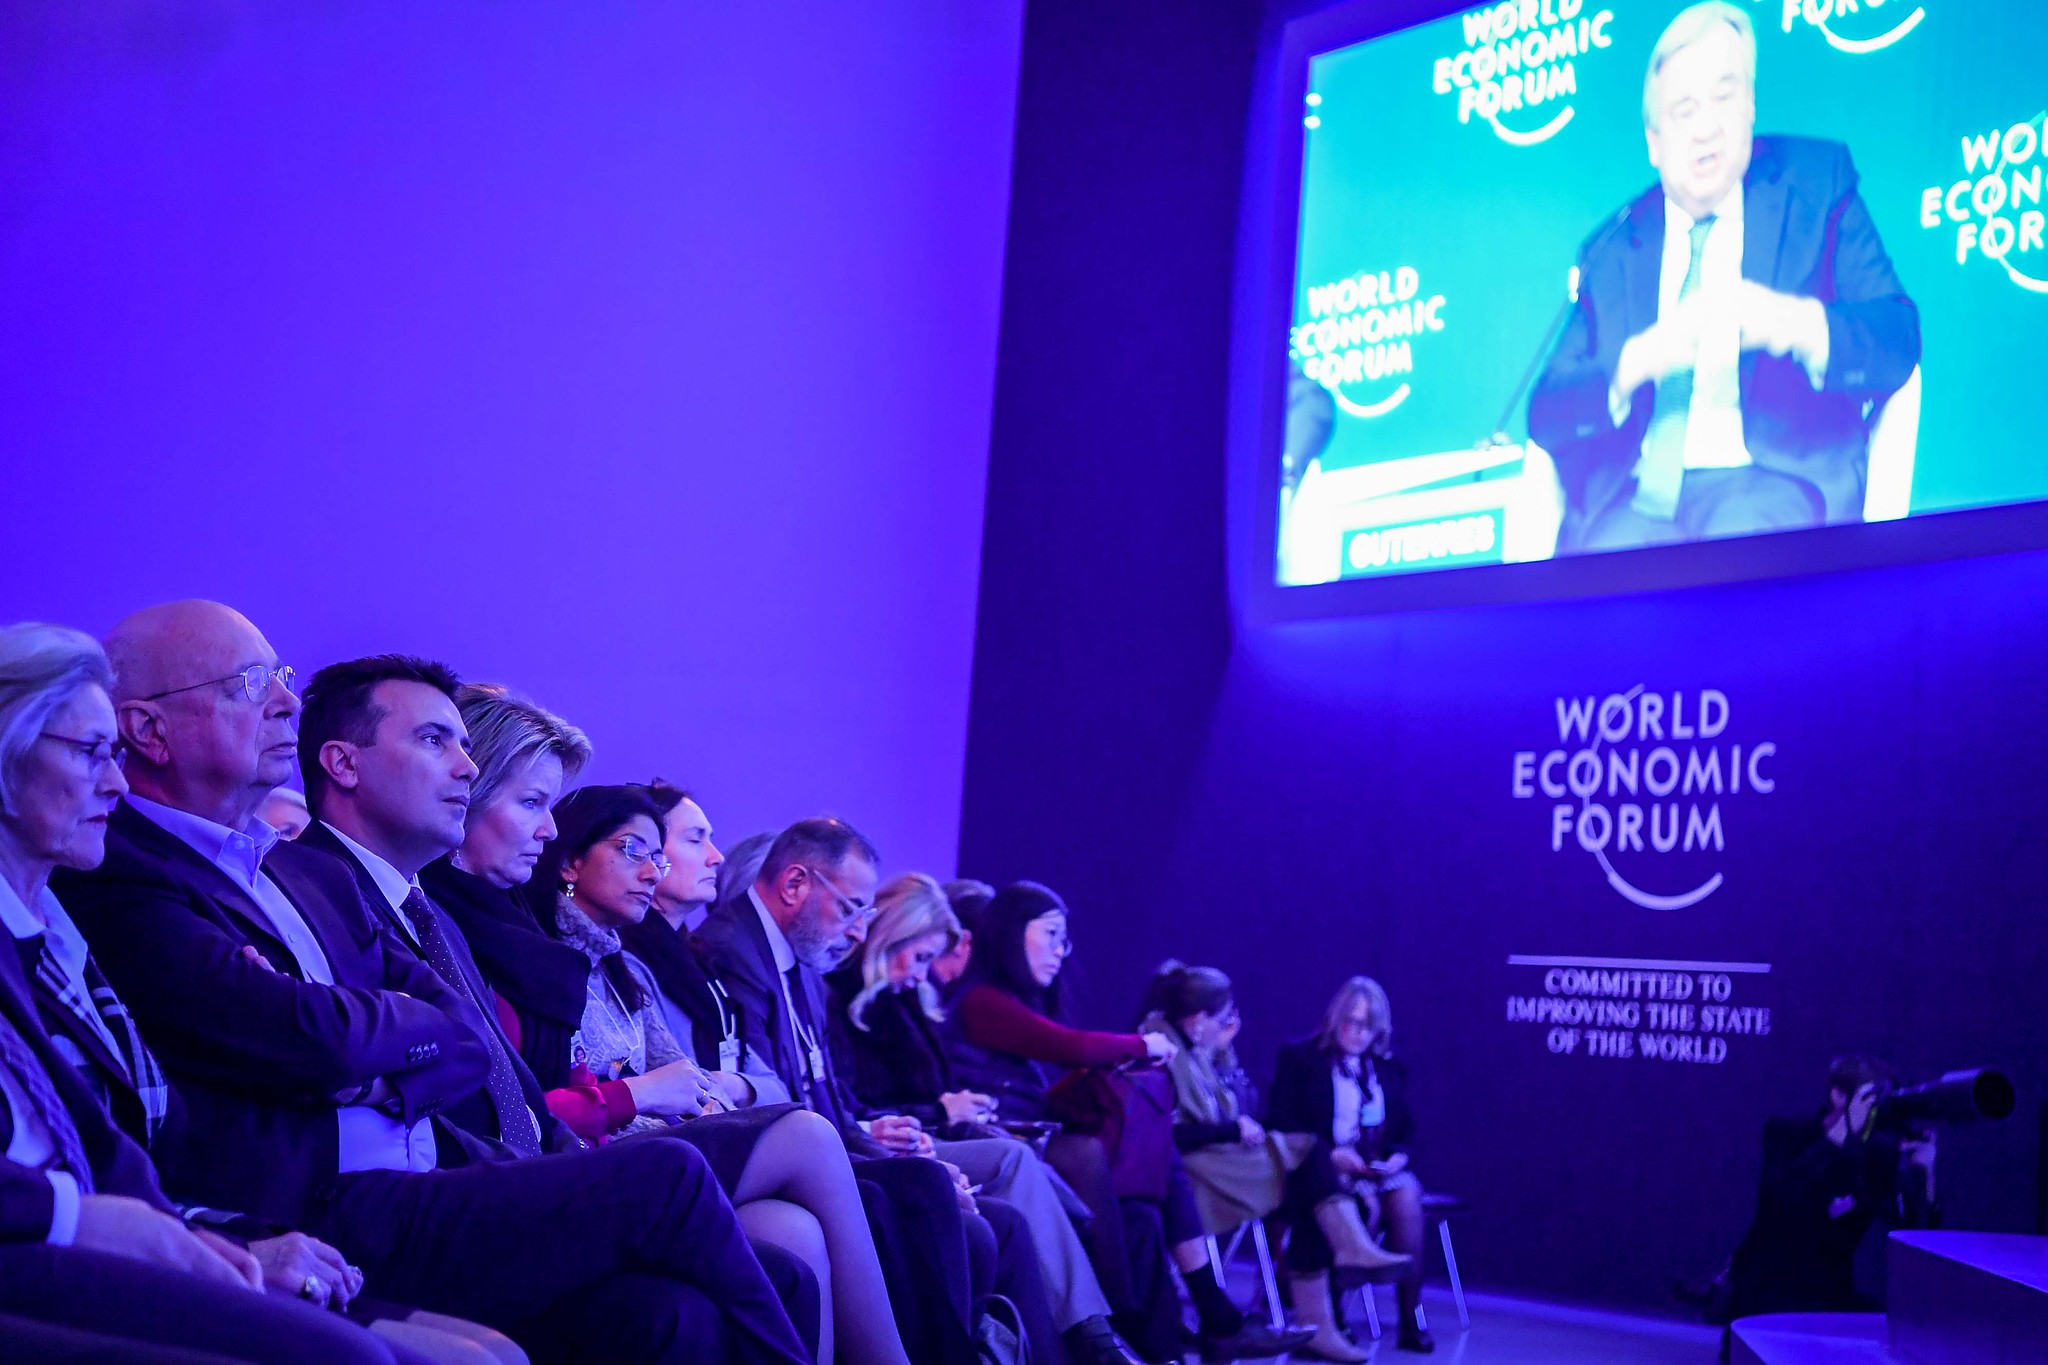 WORLD ECONOMIC FORUM - 21—24 JANUARY 2020